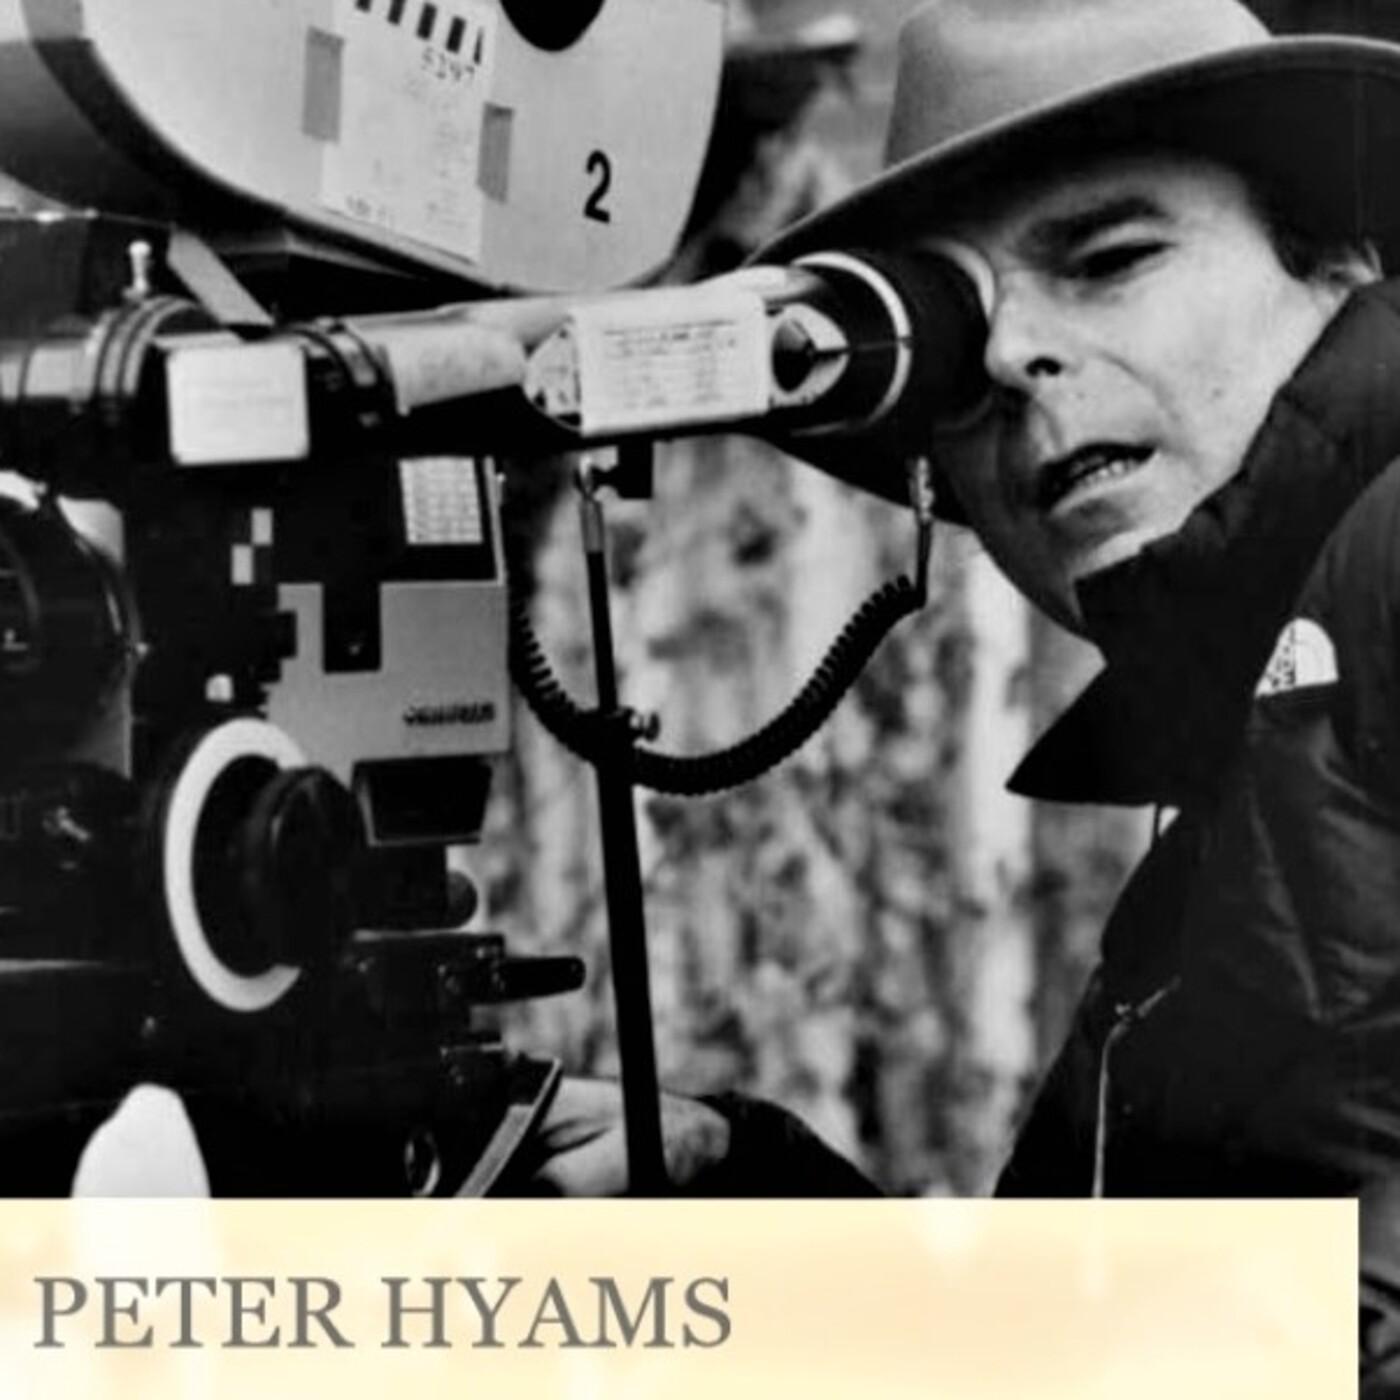 Peter Hyams